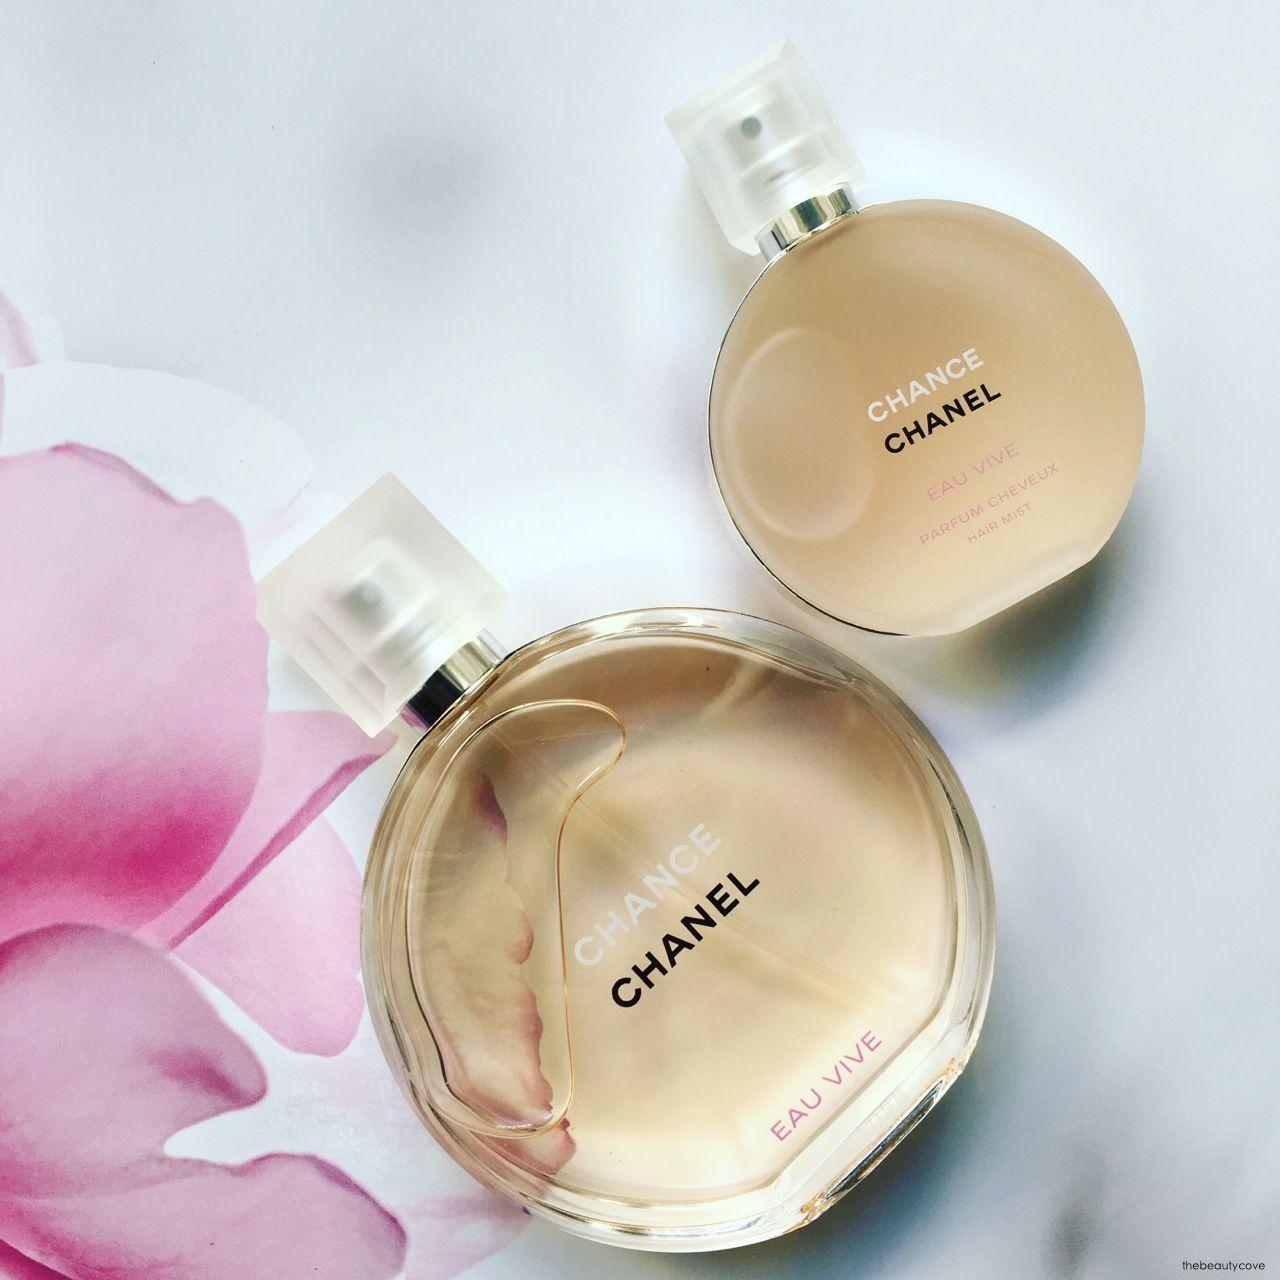 The Beauty Cove Chanel Chance Eau Vive Profumo Per Capelli E